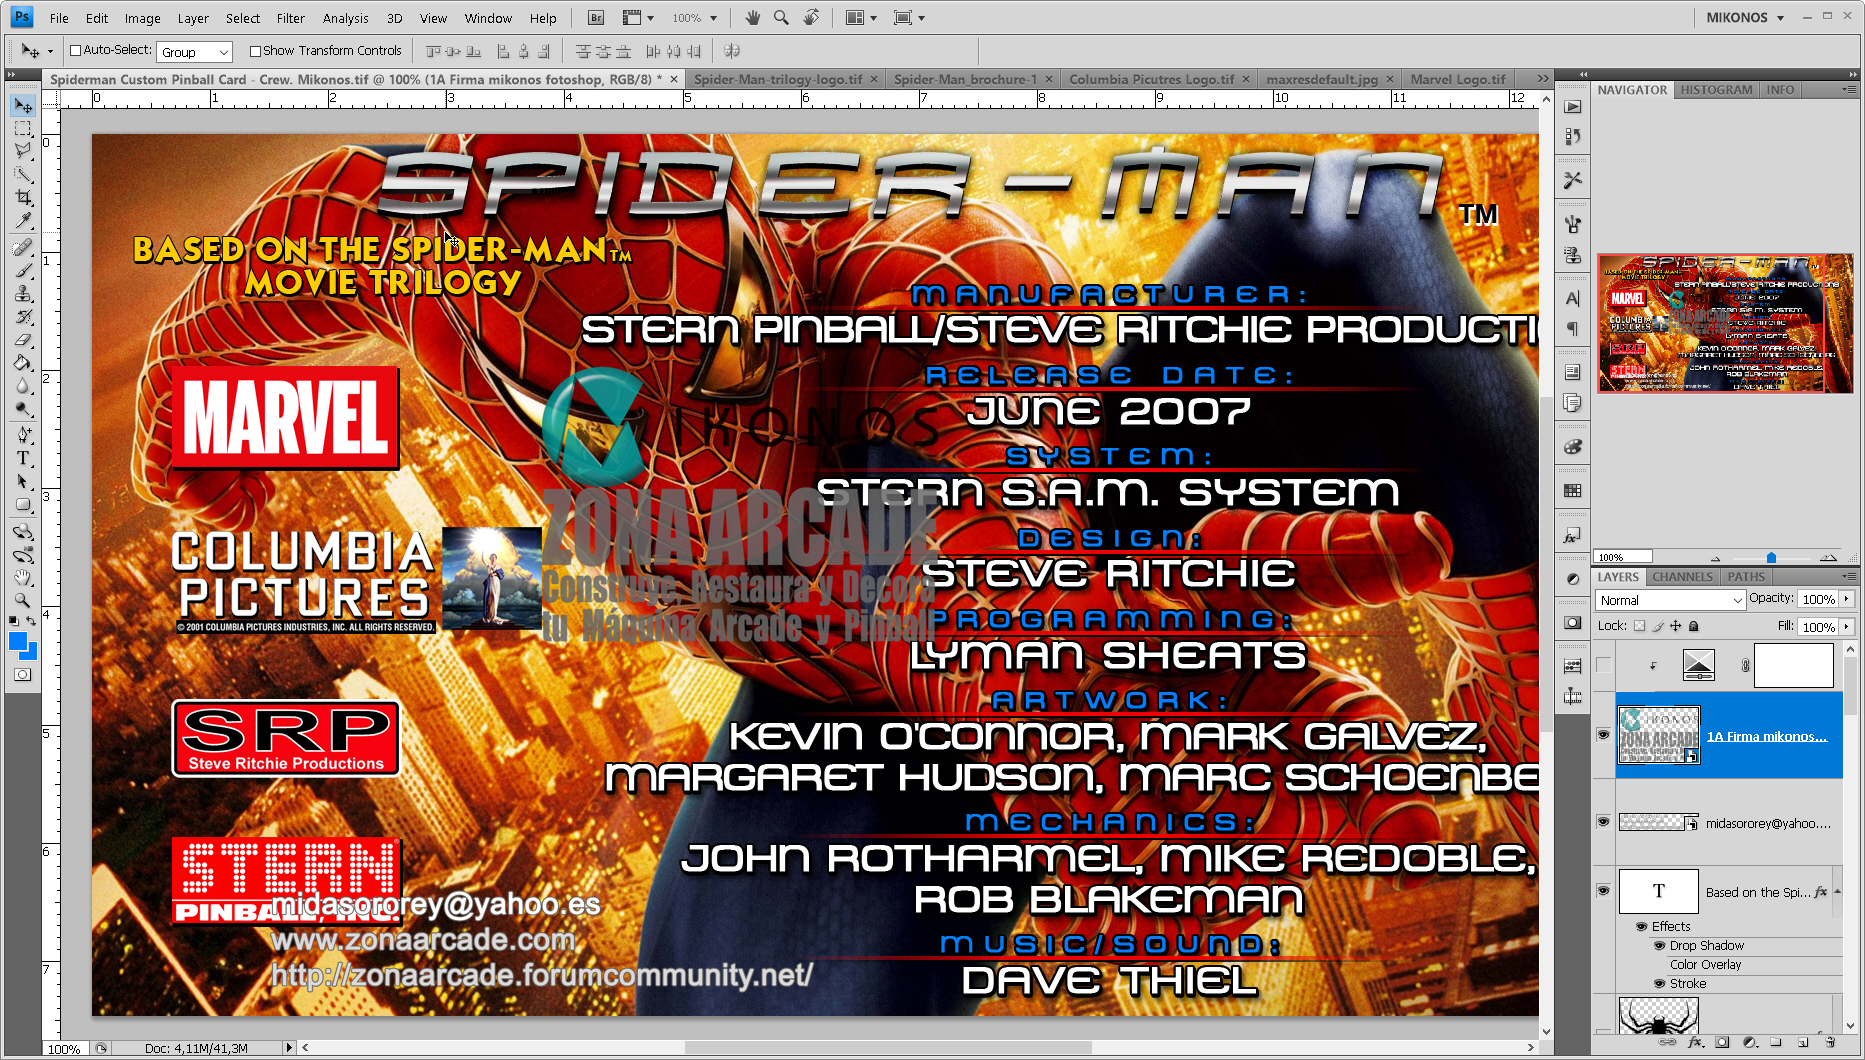 Spiderman%20Custom%20Pinball%20Card%20-%20Crew.%20Mikonos2.jpg